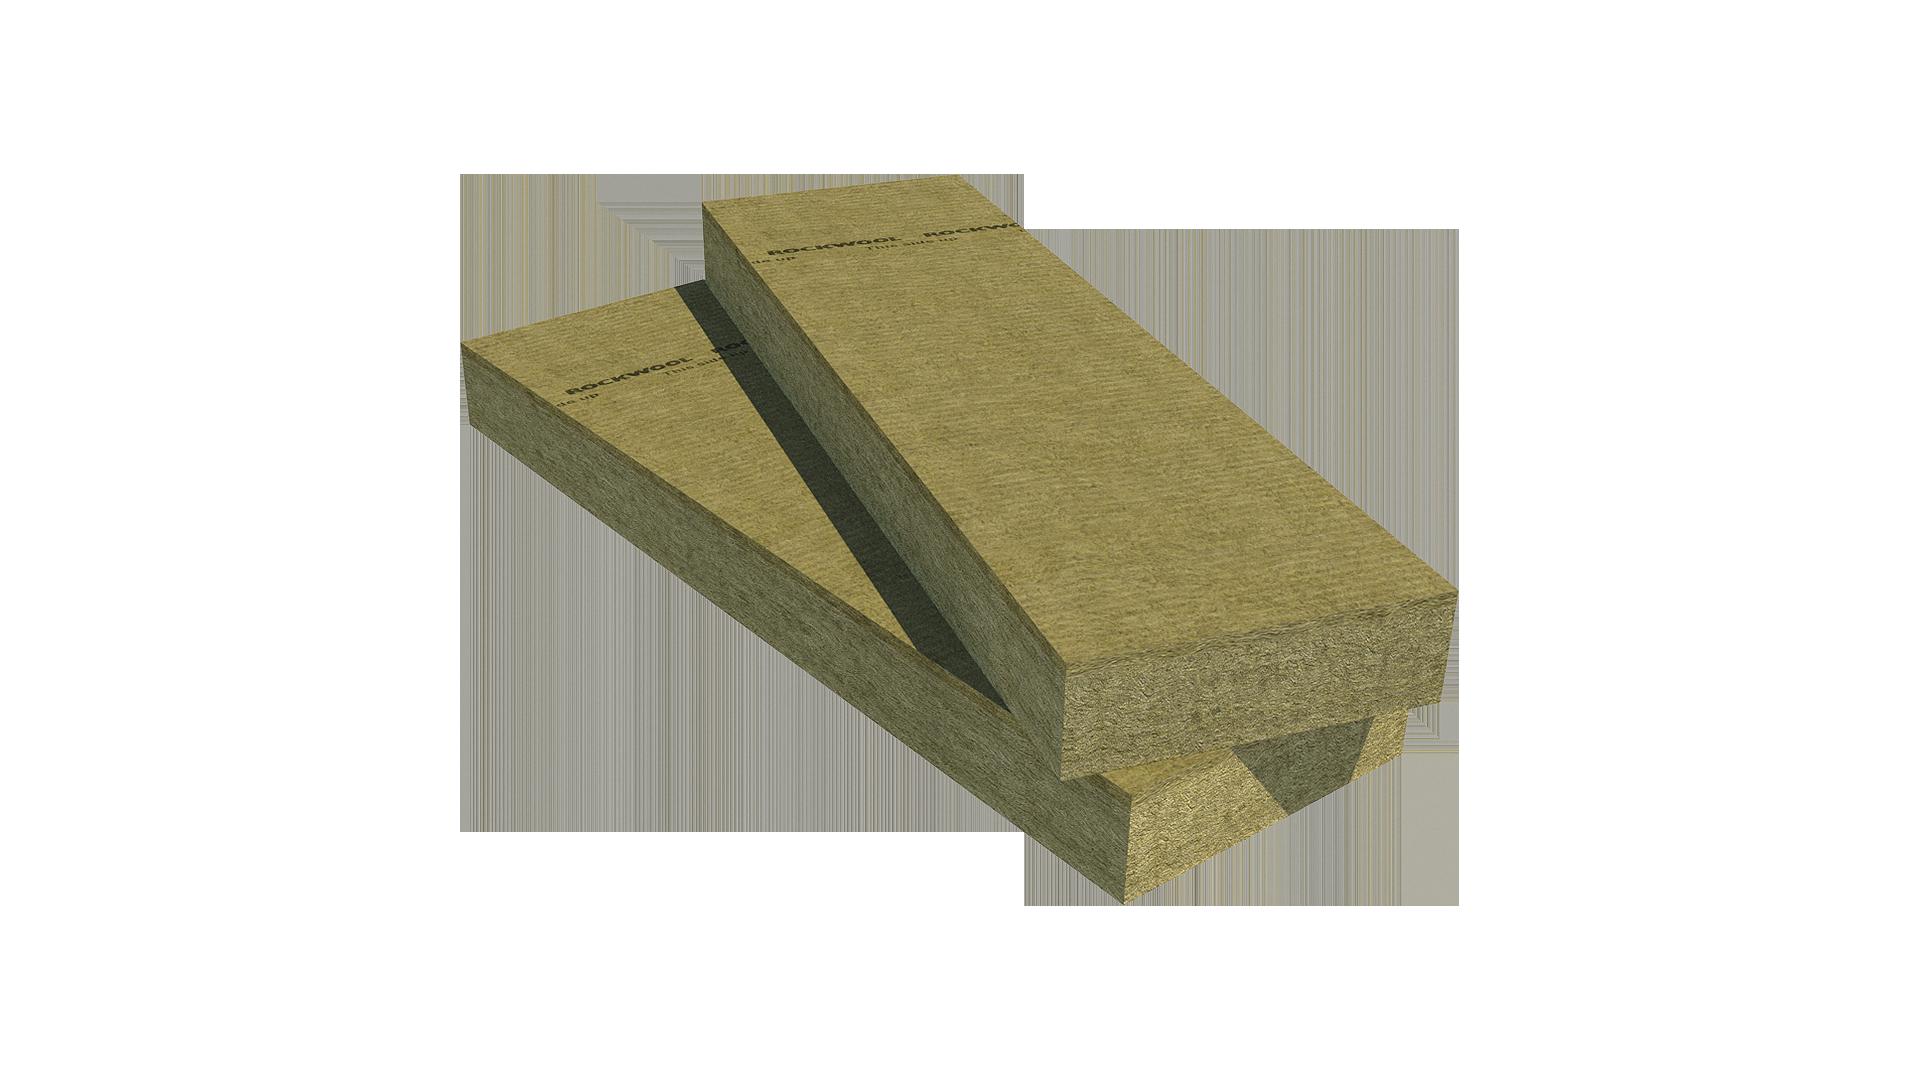 HARDROCK (DD) TRB  - Flat Roof Thermal Application